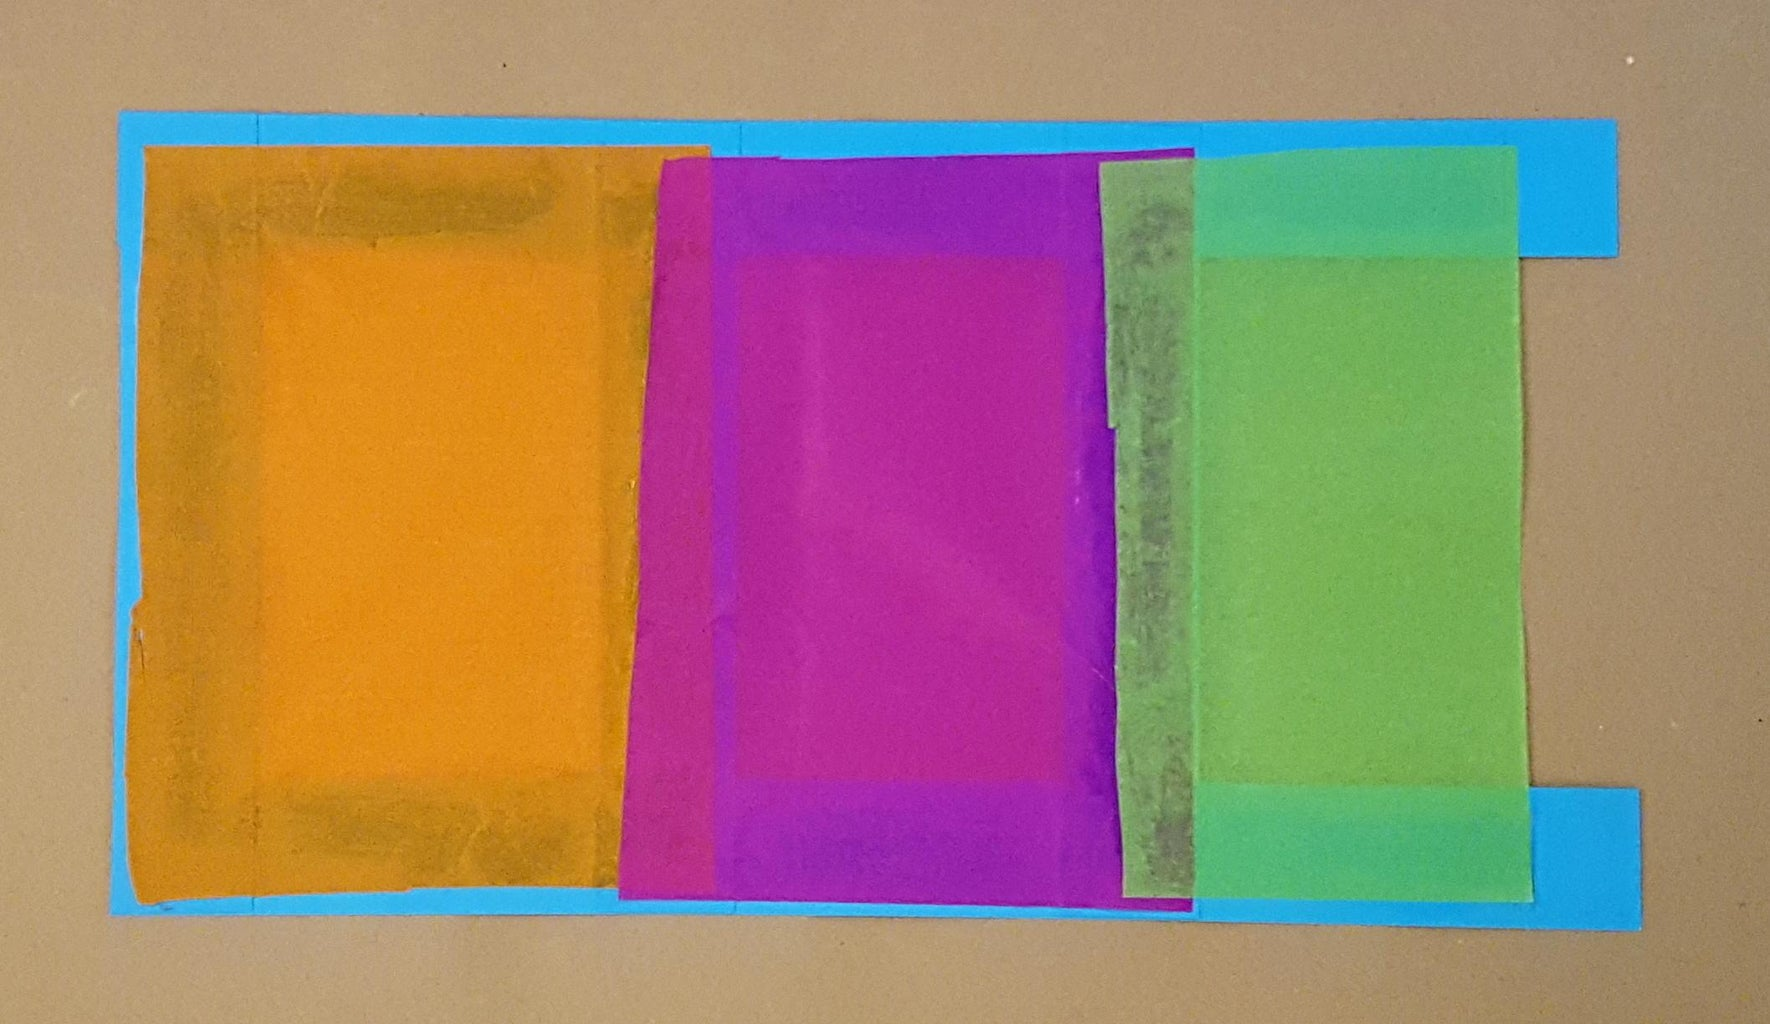 Cut the Tissue Paper